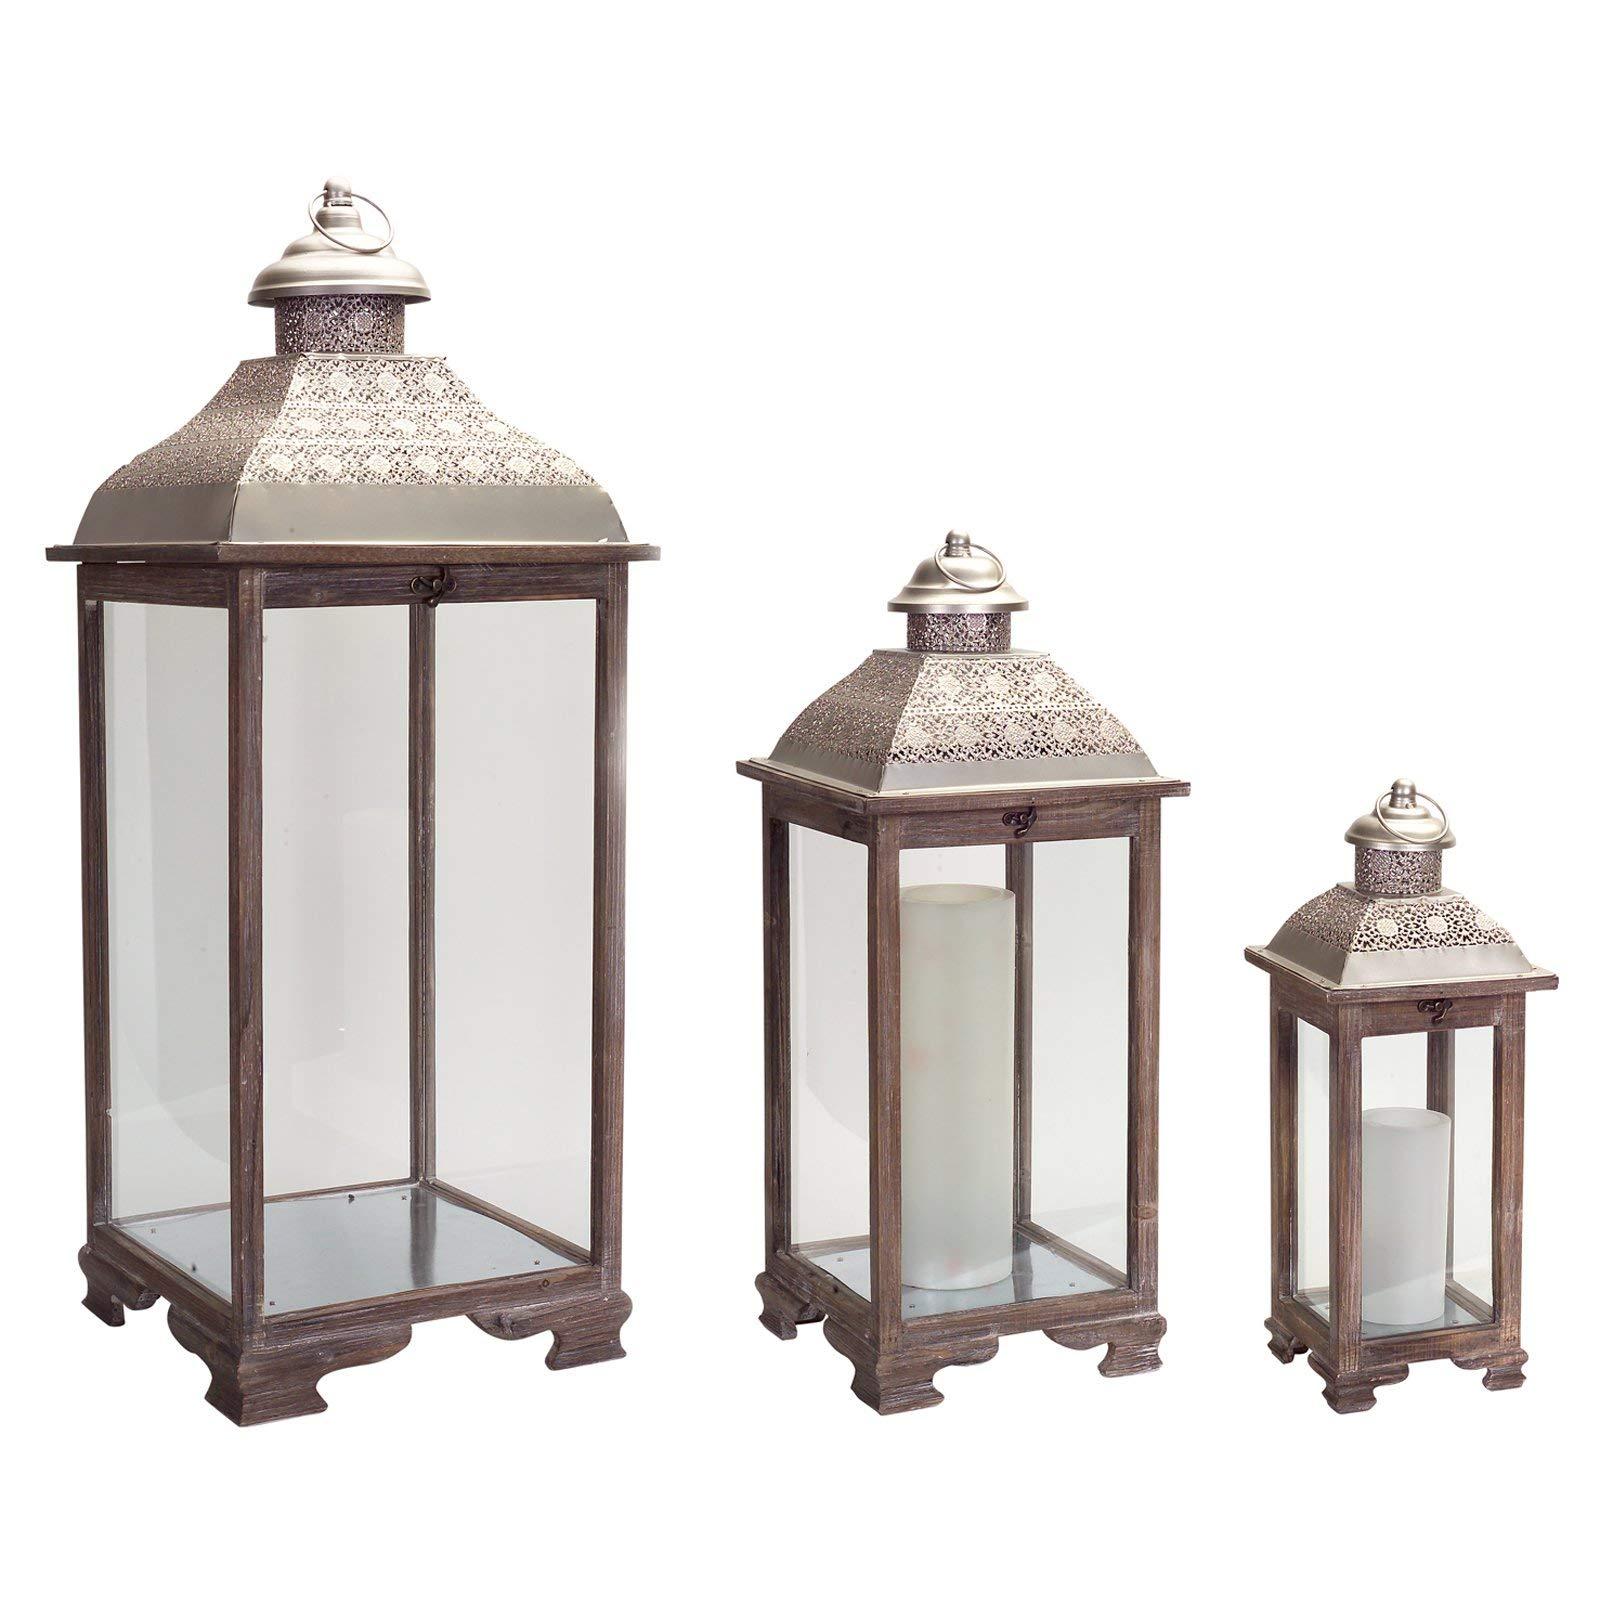 Melrose International Gray Lantern, Set of Three